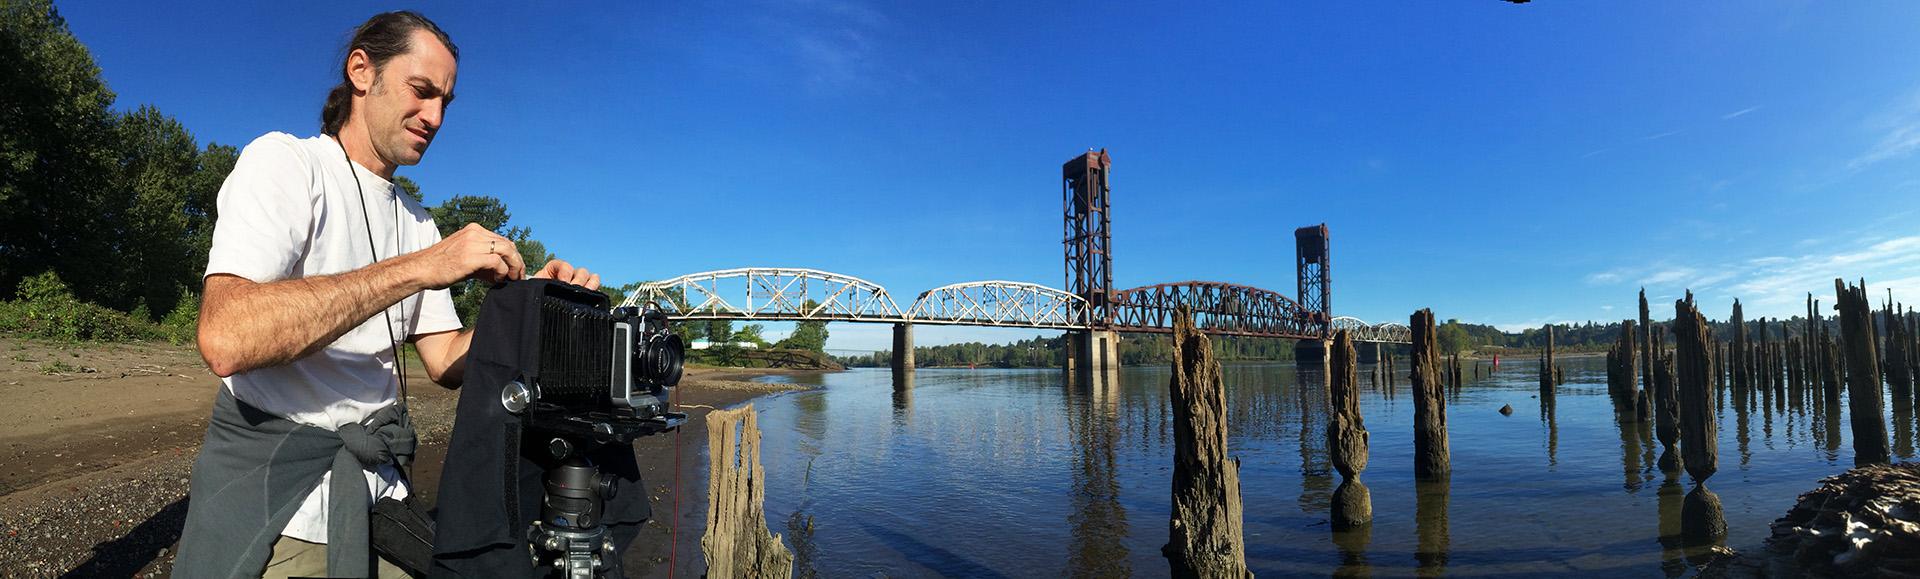 Brant Bridge Pano.jpg